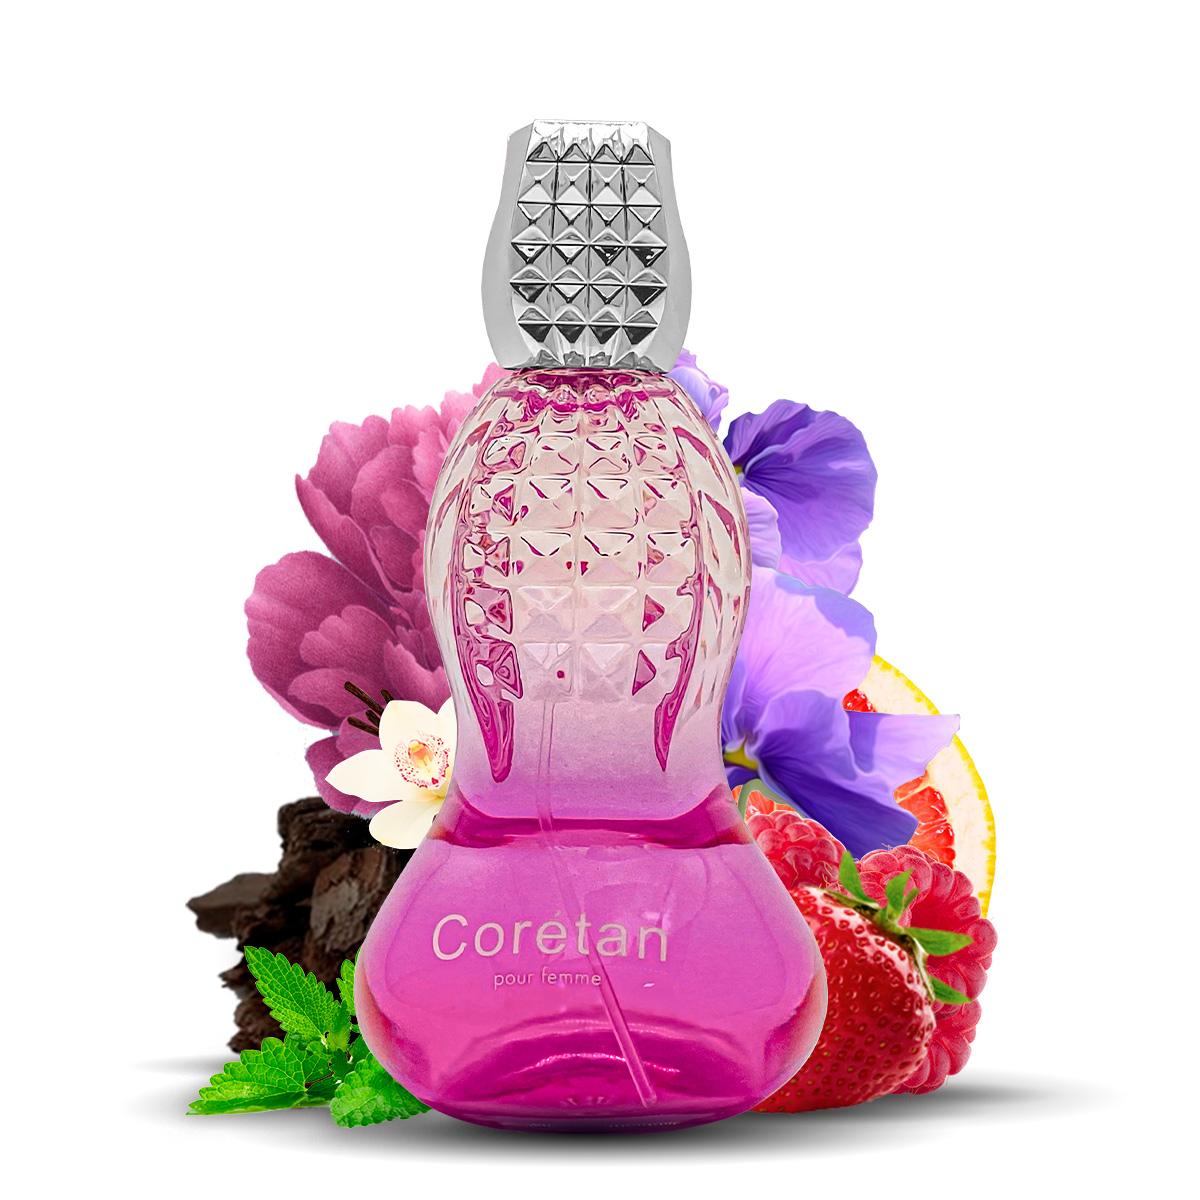 Kit 2 Perfumes Importados Coretan e Ferous Black I Scents